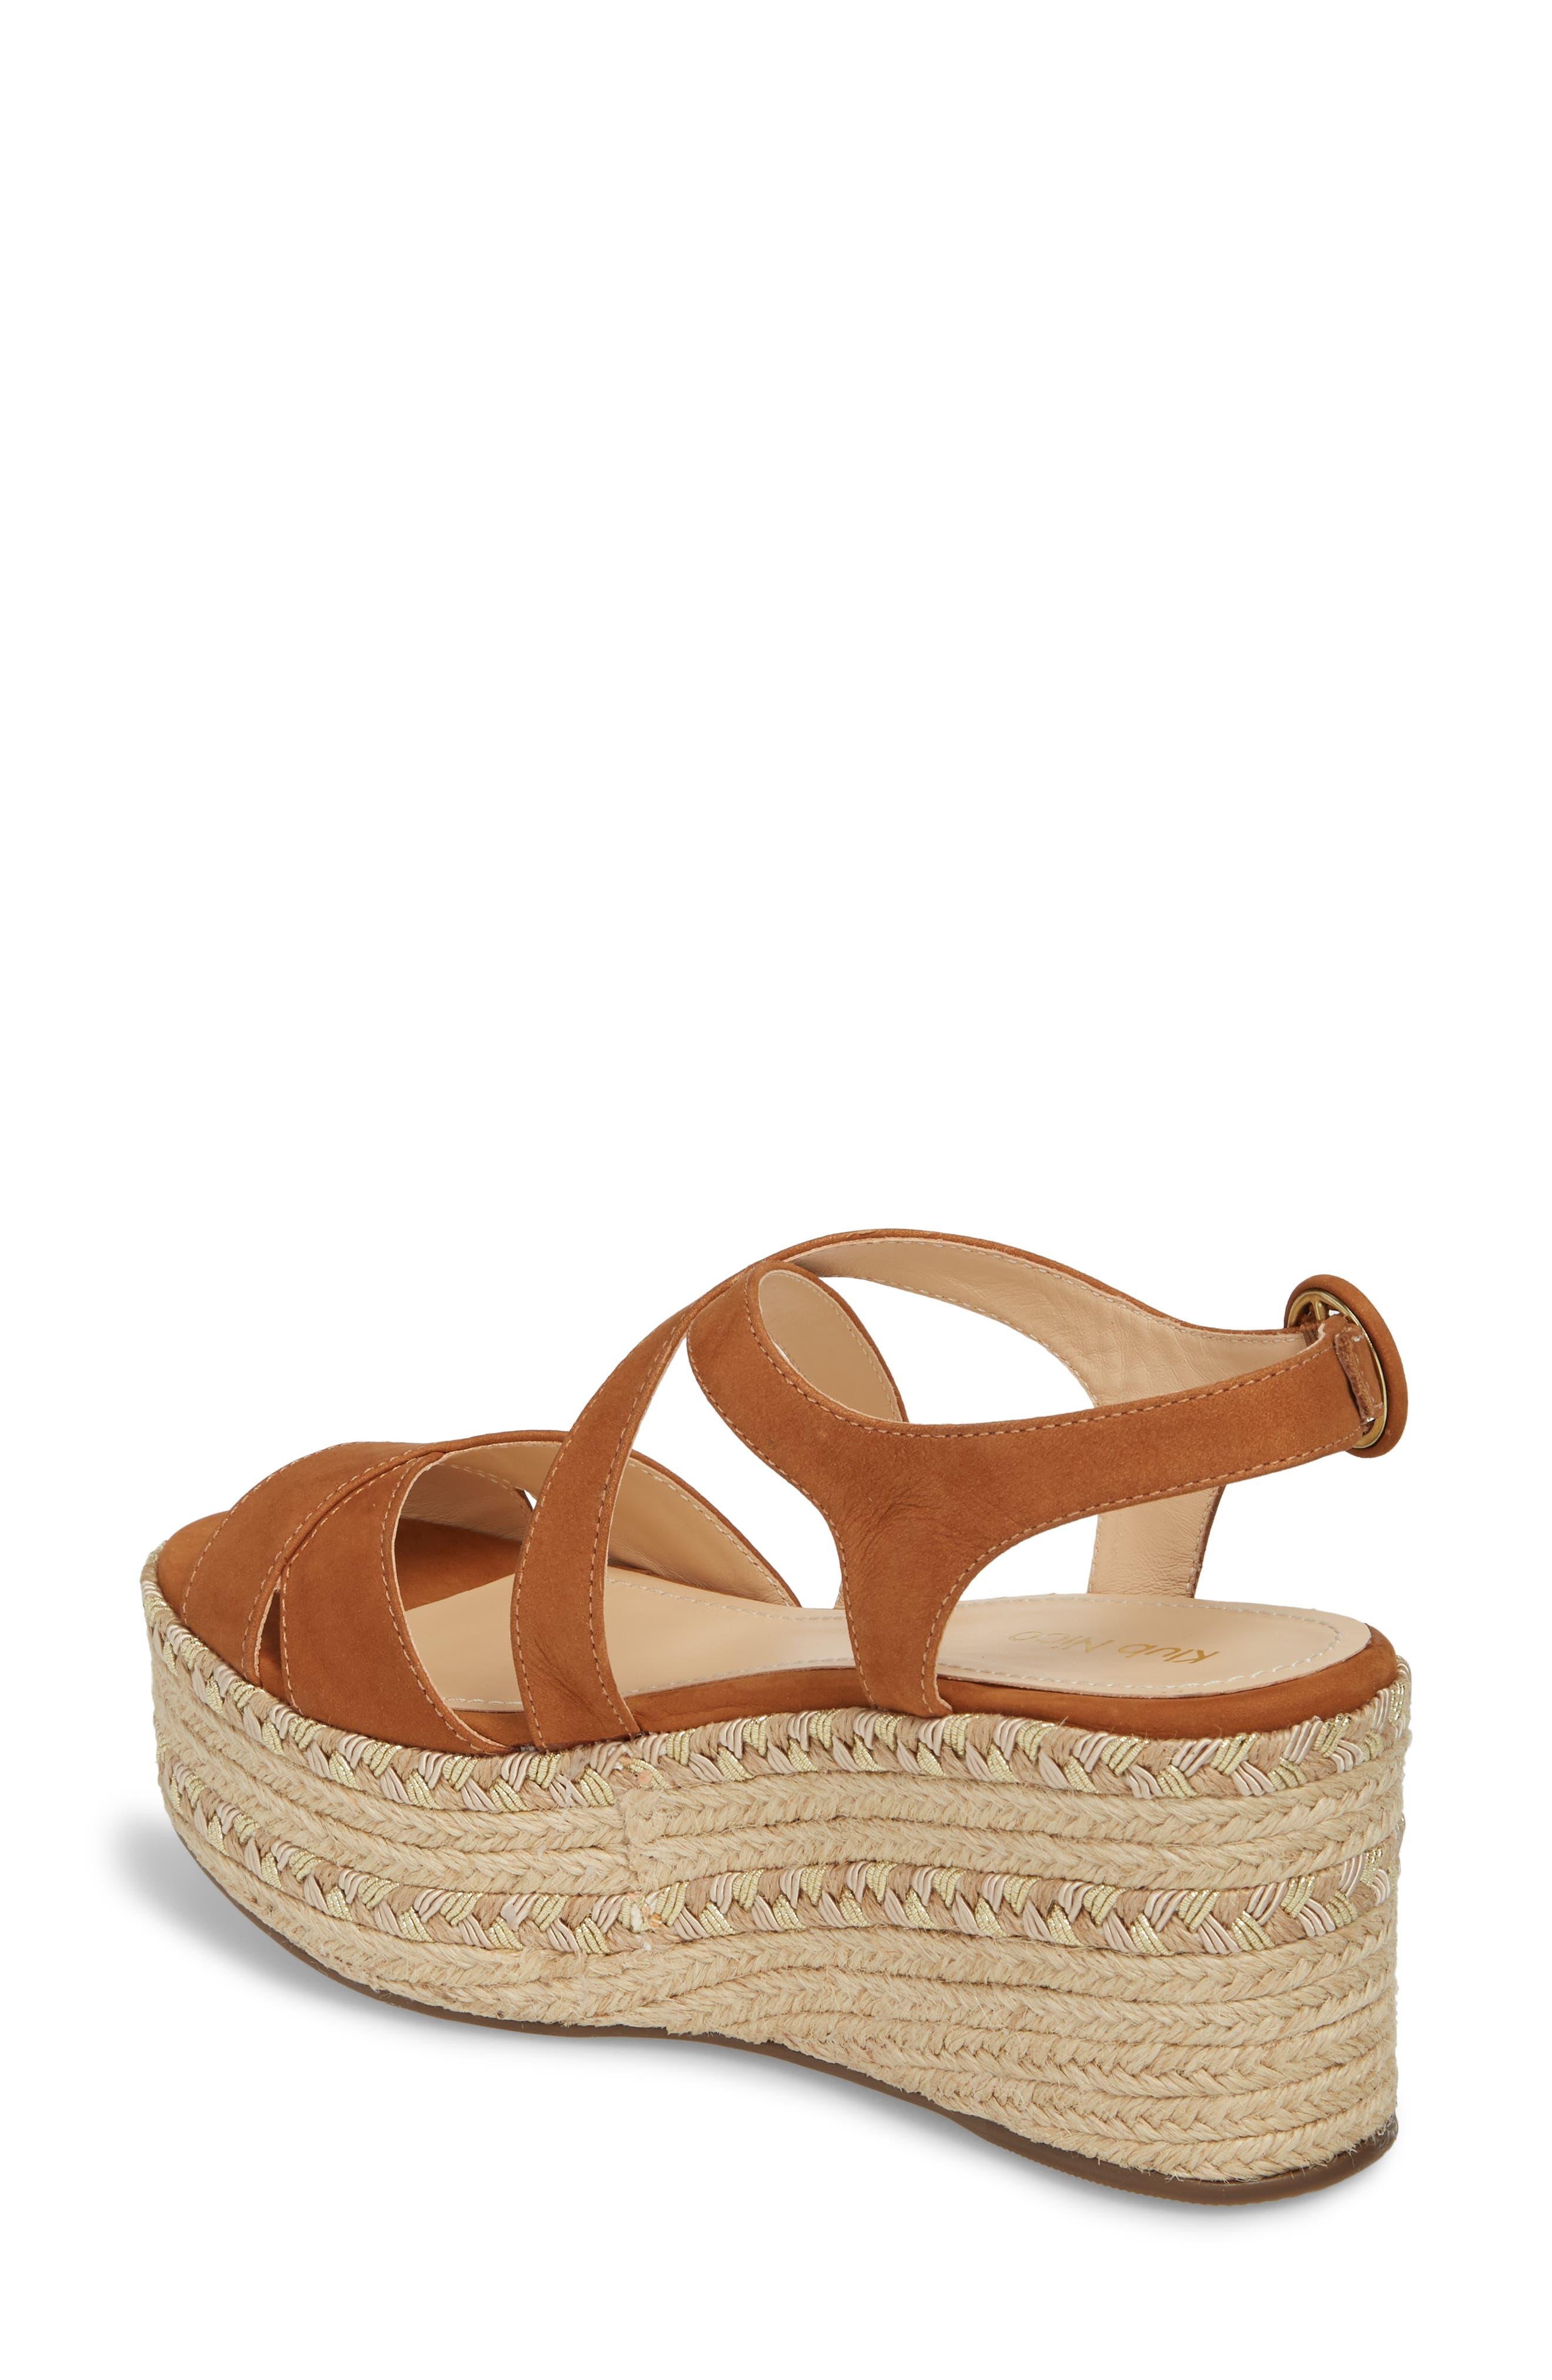 Vikki Espadrille Platform Sandal,                             Alternate thumbnail 2, color,                             Tan Leather